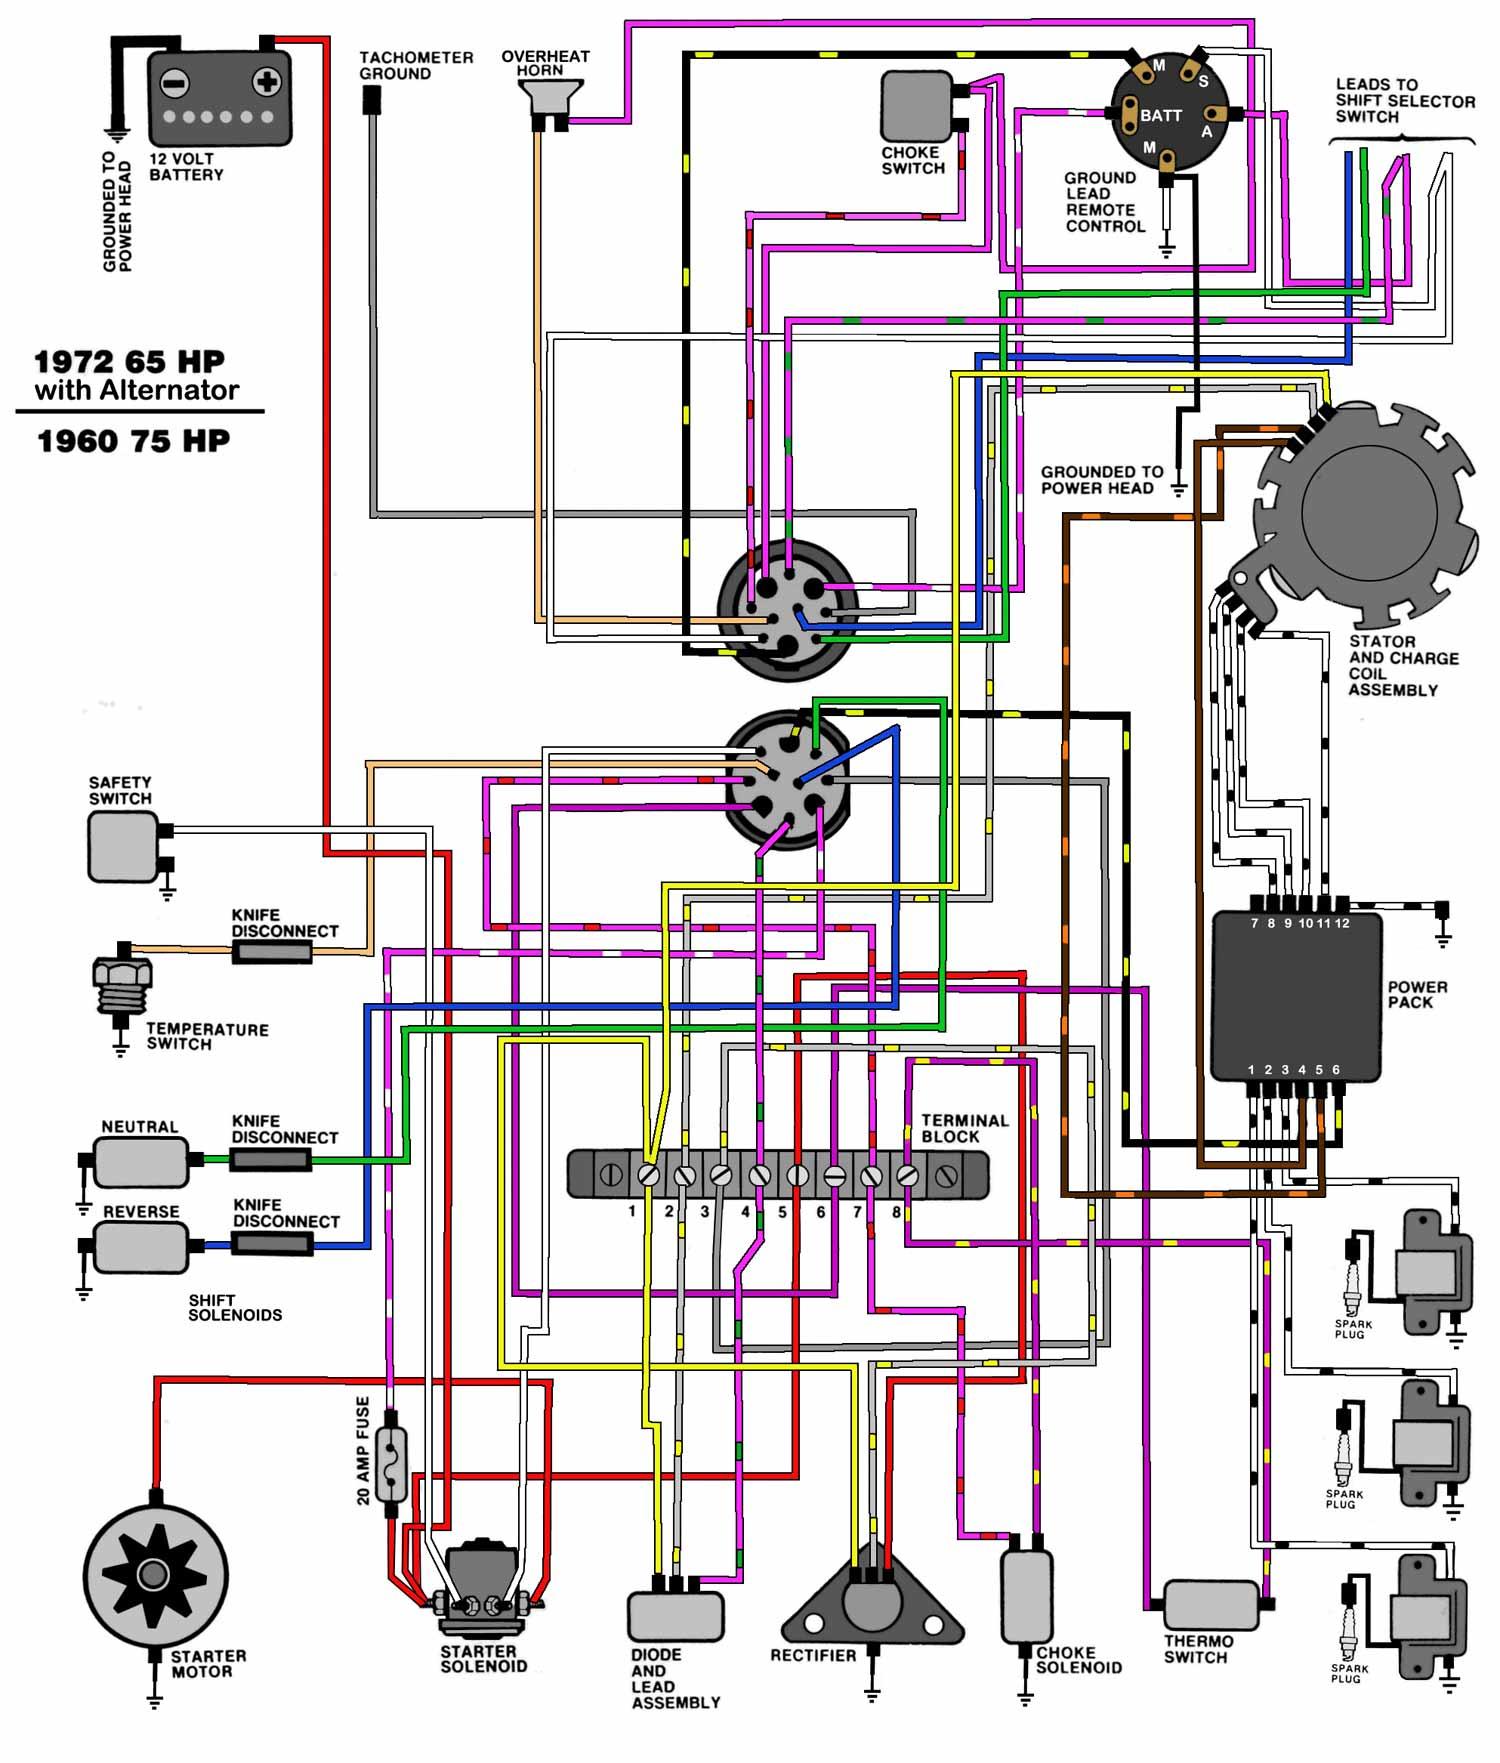 Underglow Wiring Diagram Schematics Diagrams John Deere 310d Backhoe 310sj Car Light Switch